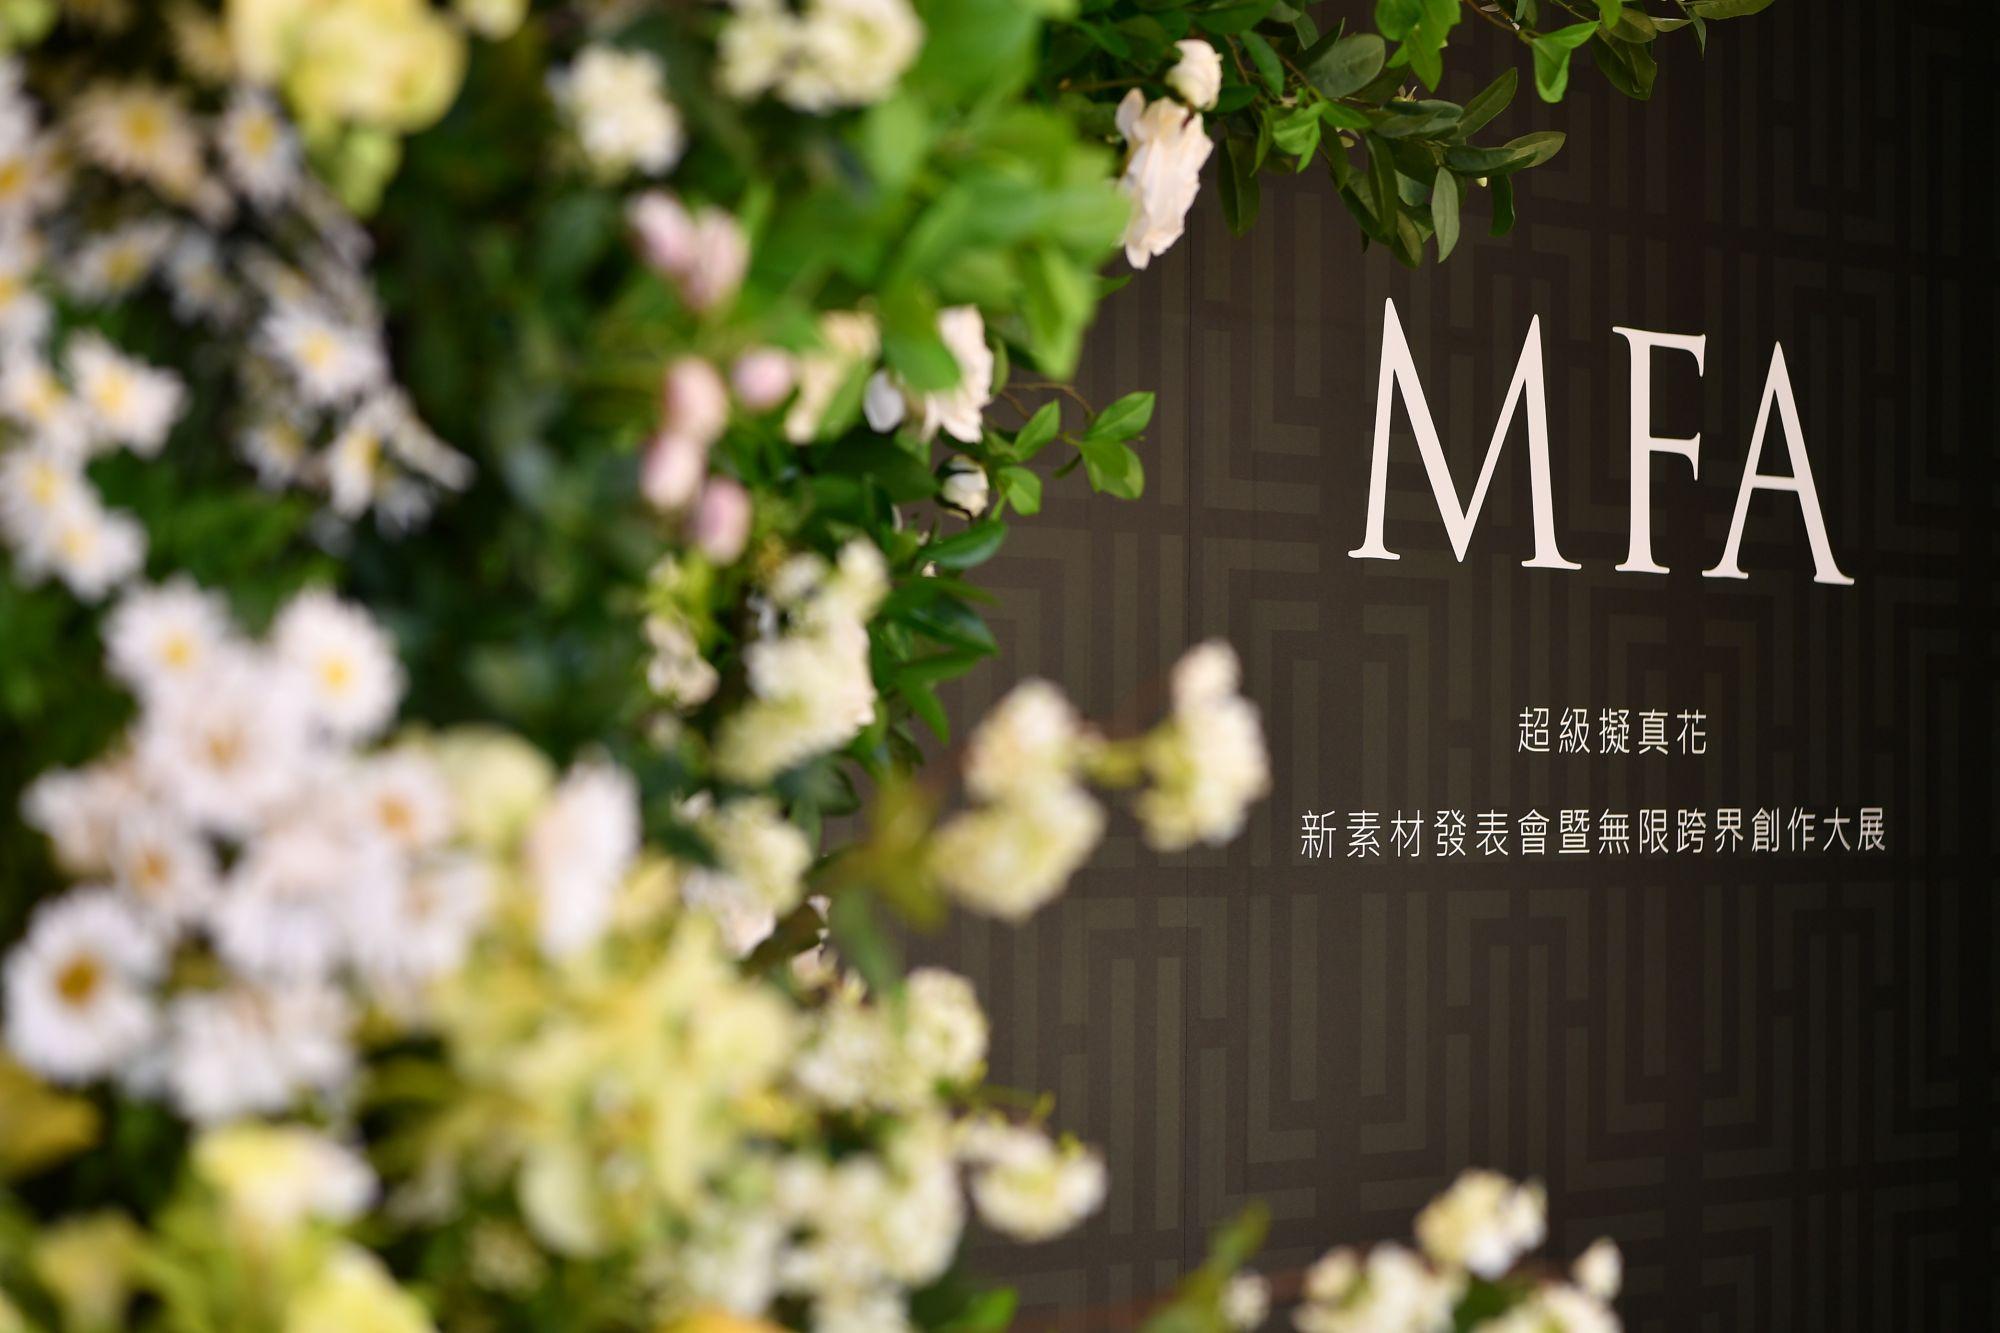 MFA 頂級訂製花禮無限跨界創作藝術大展